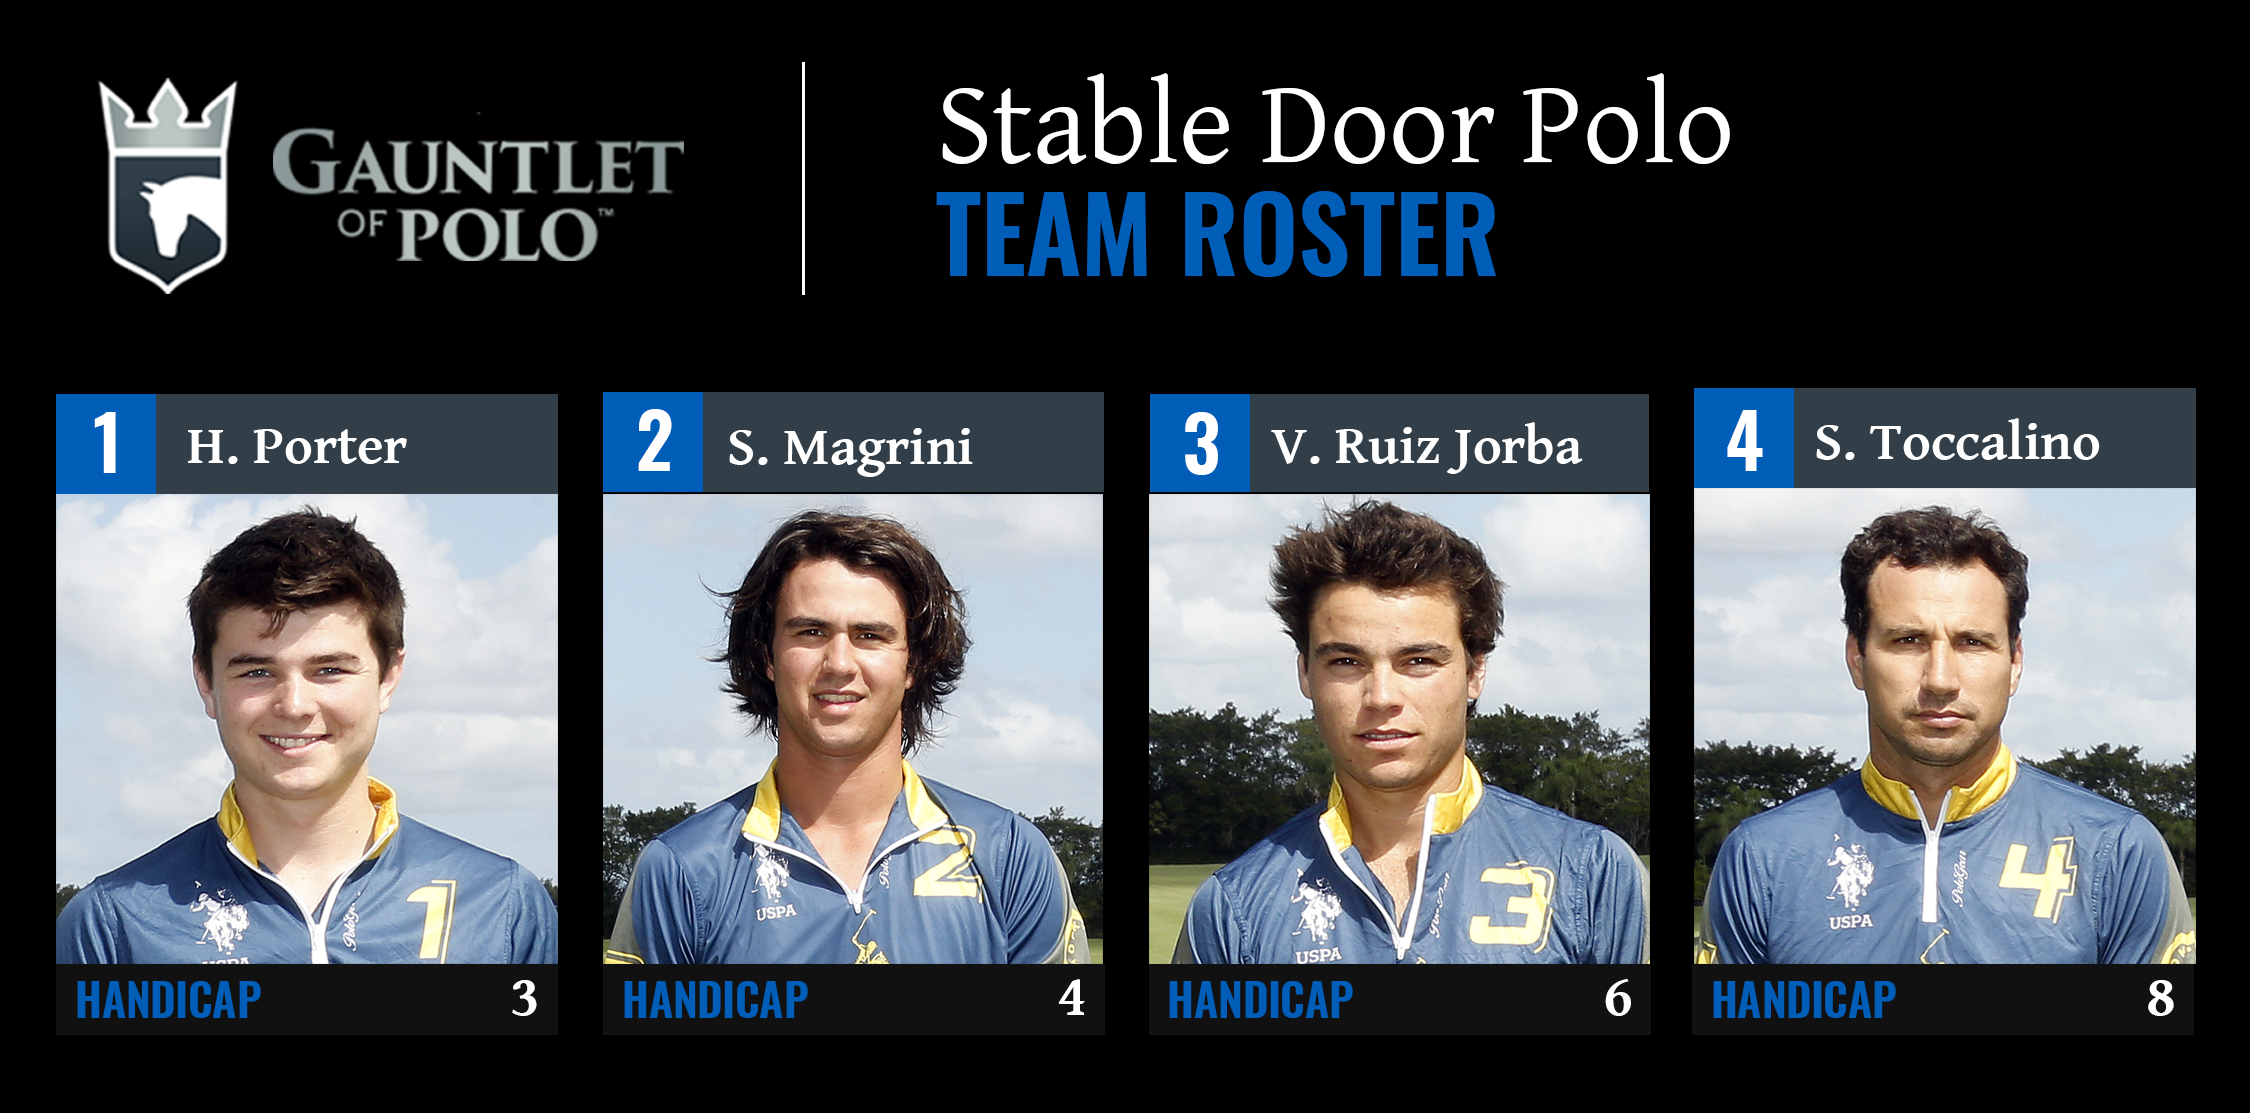 Stable Door Polo